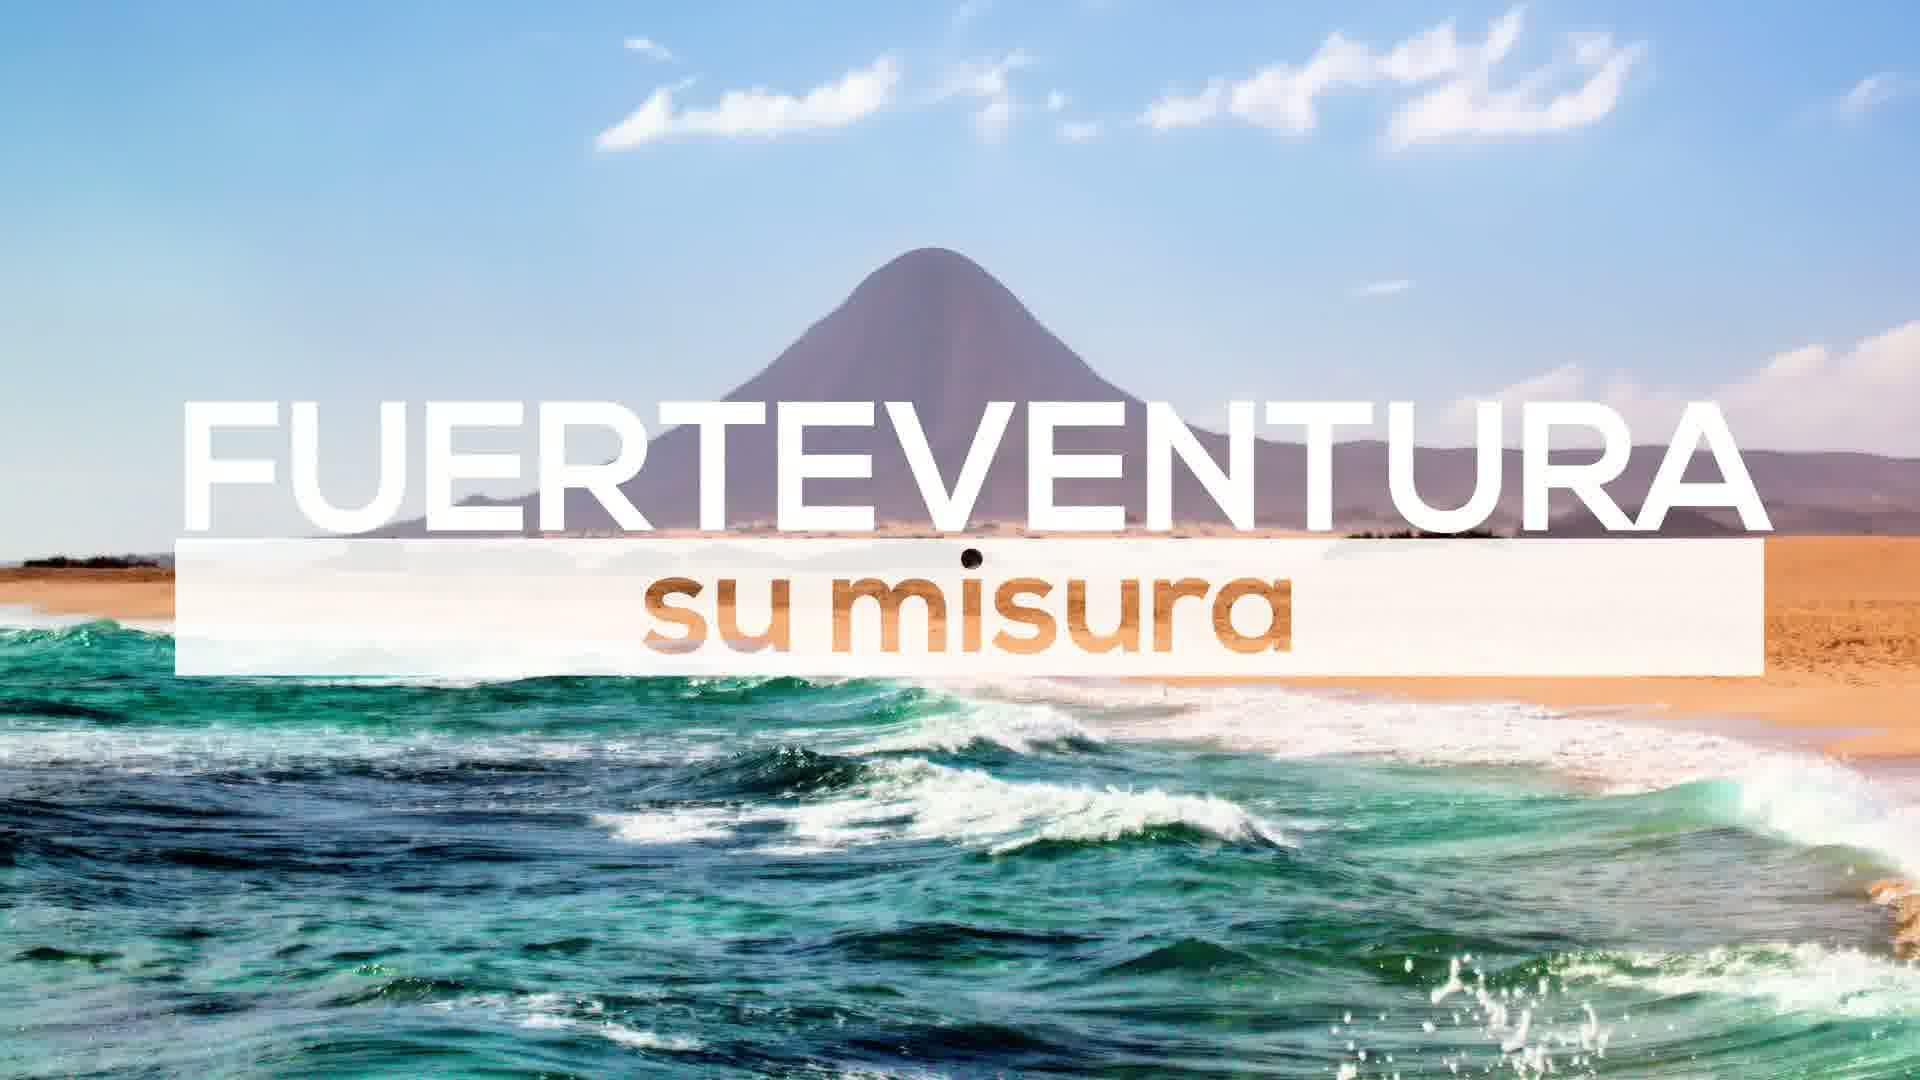 Guida Fuerteventura convertito